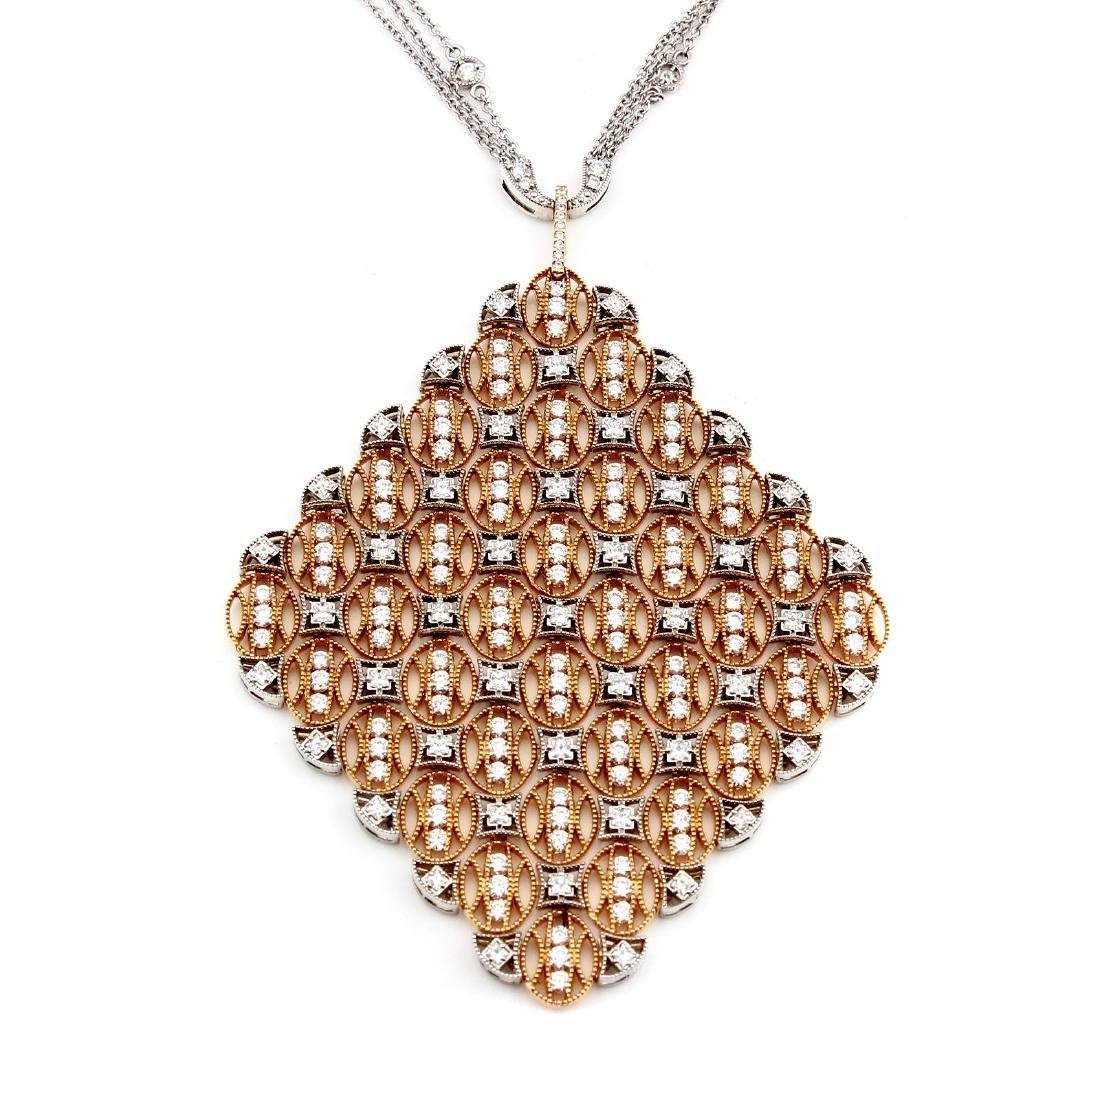 Tacori Vault 18KT White Rose Gold Afleuress Collection